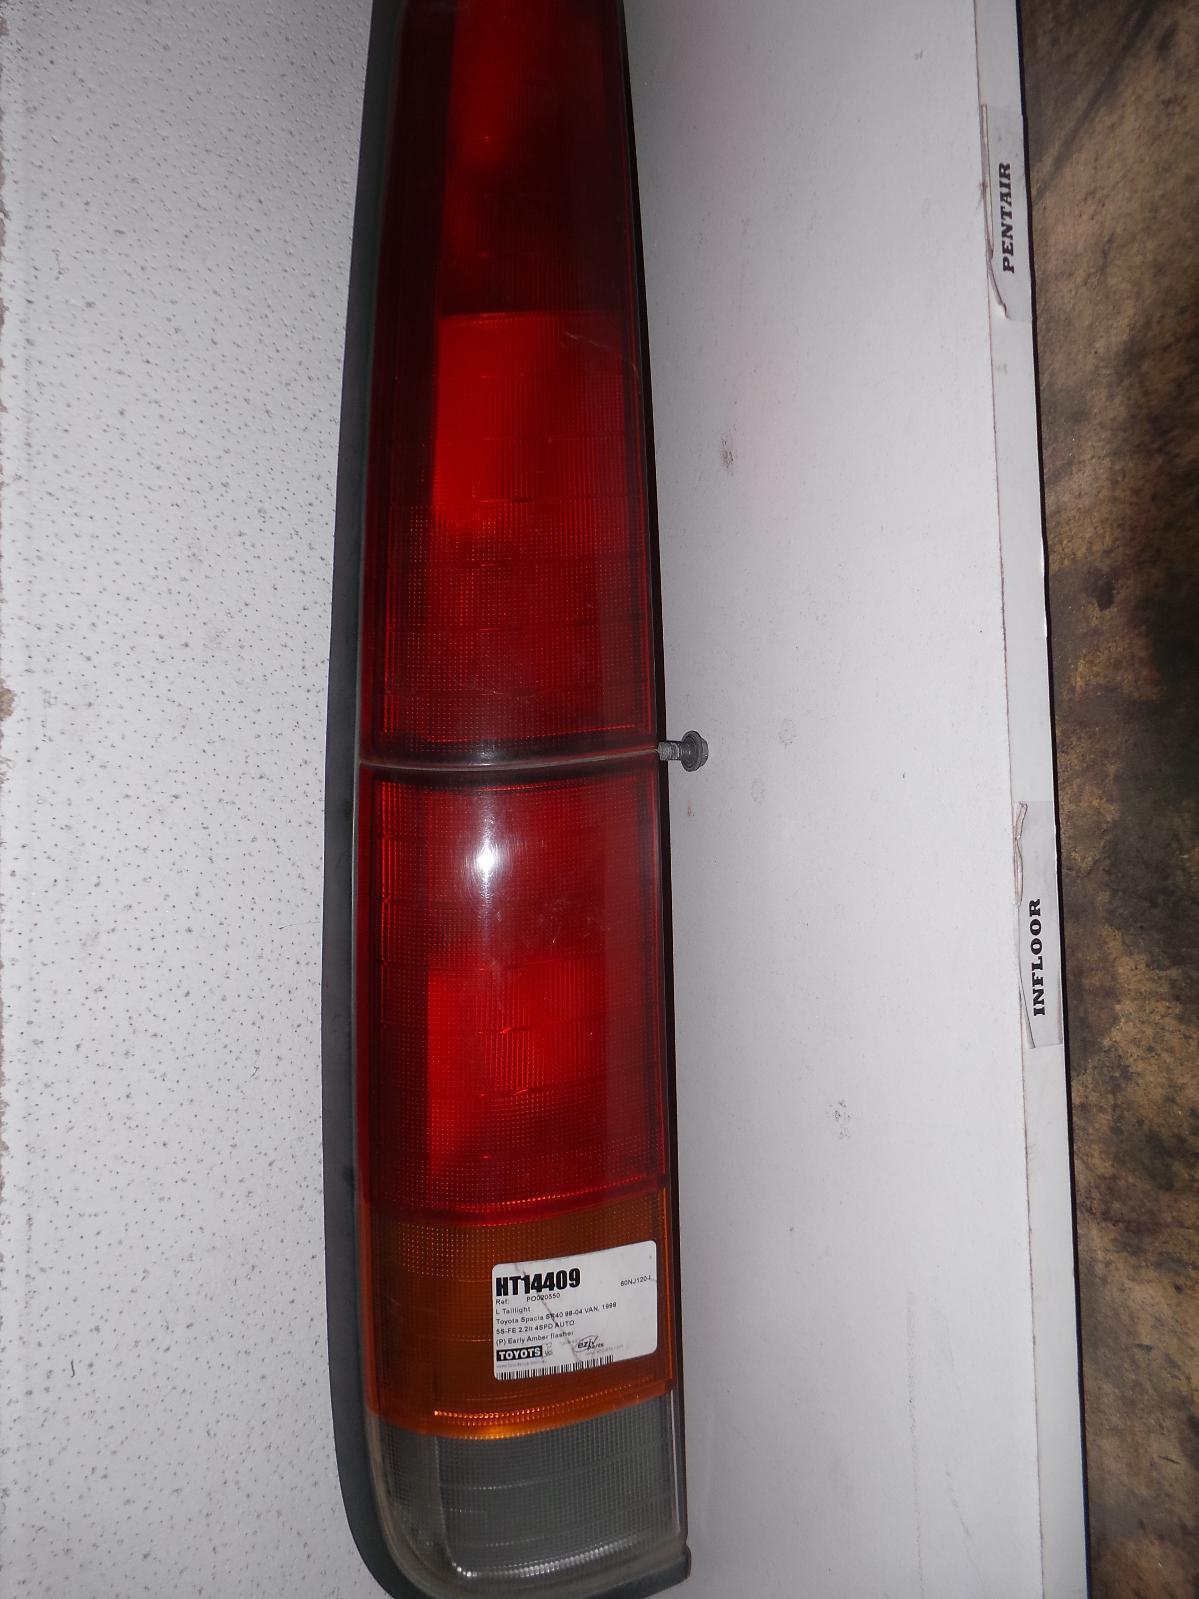 TOYOTA SPACIA, Left Taillight, SR40 02/98-12/98